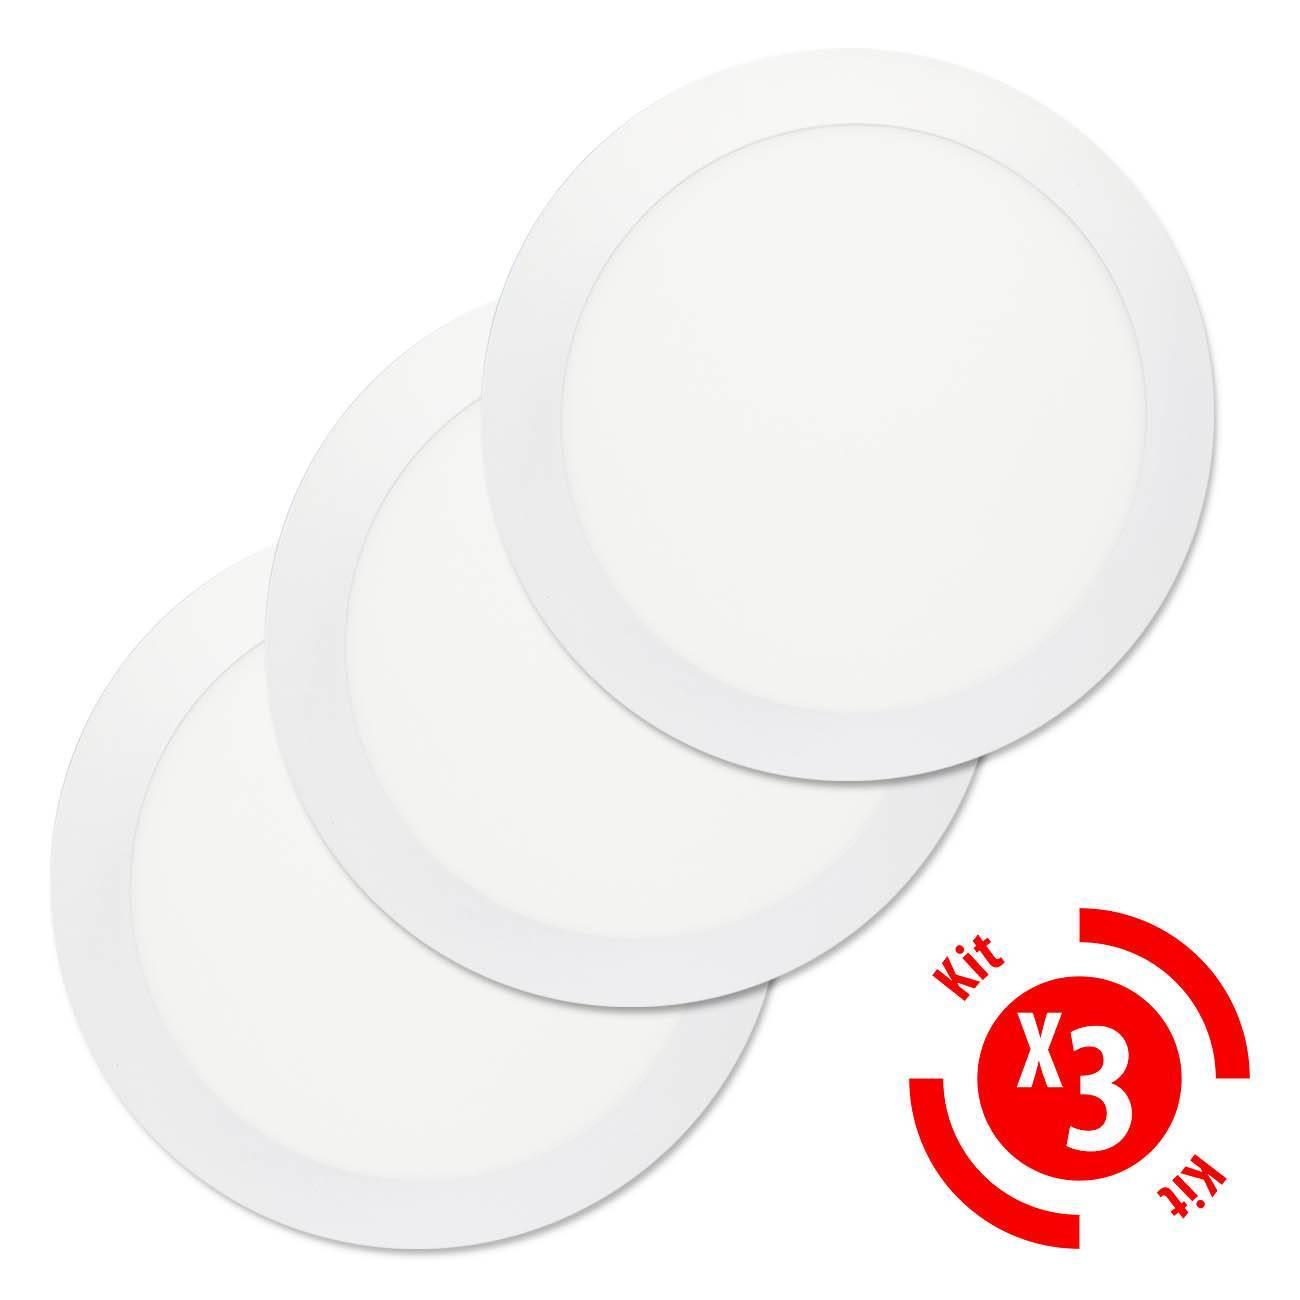 Luminária Plafon Led Embutir Slim Redondo 18w Branco Frio Ki - LCGELETRO